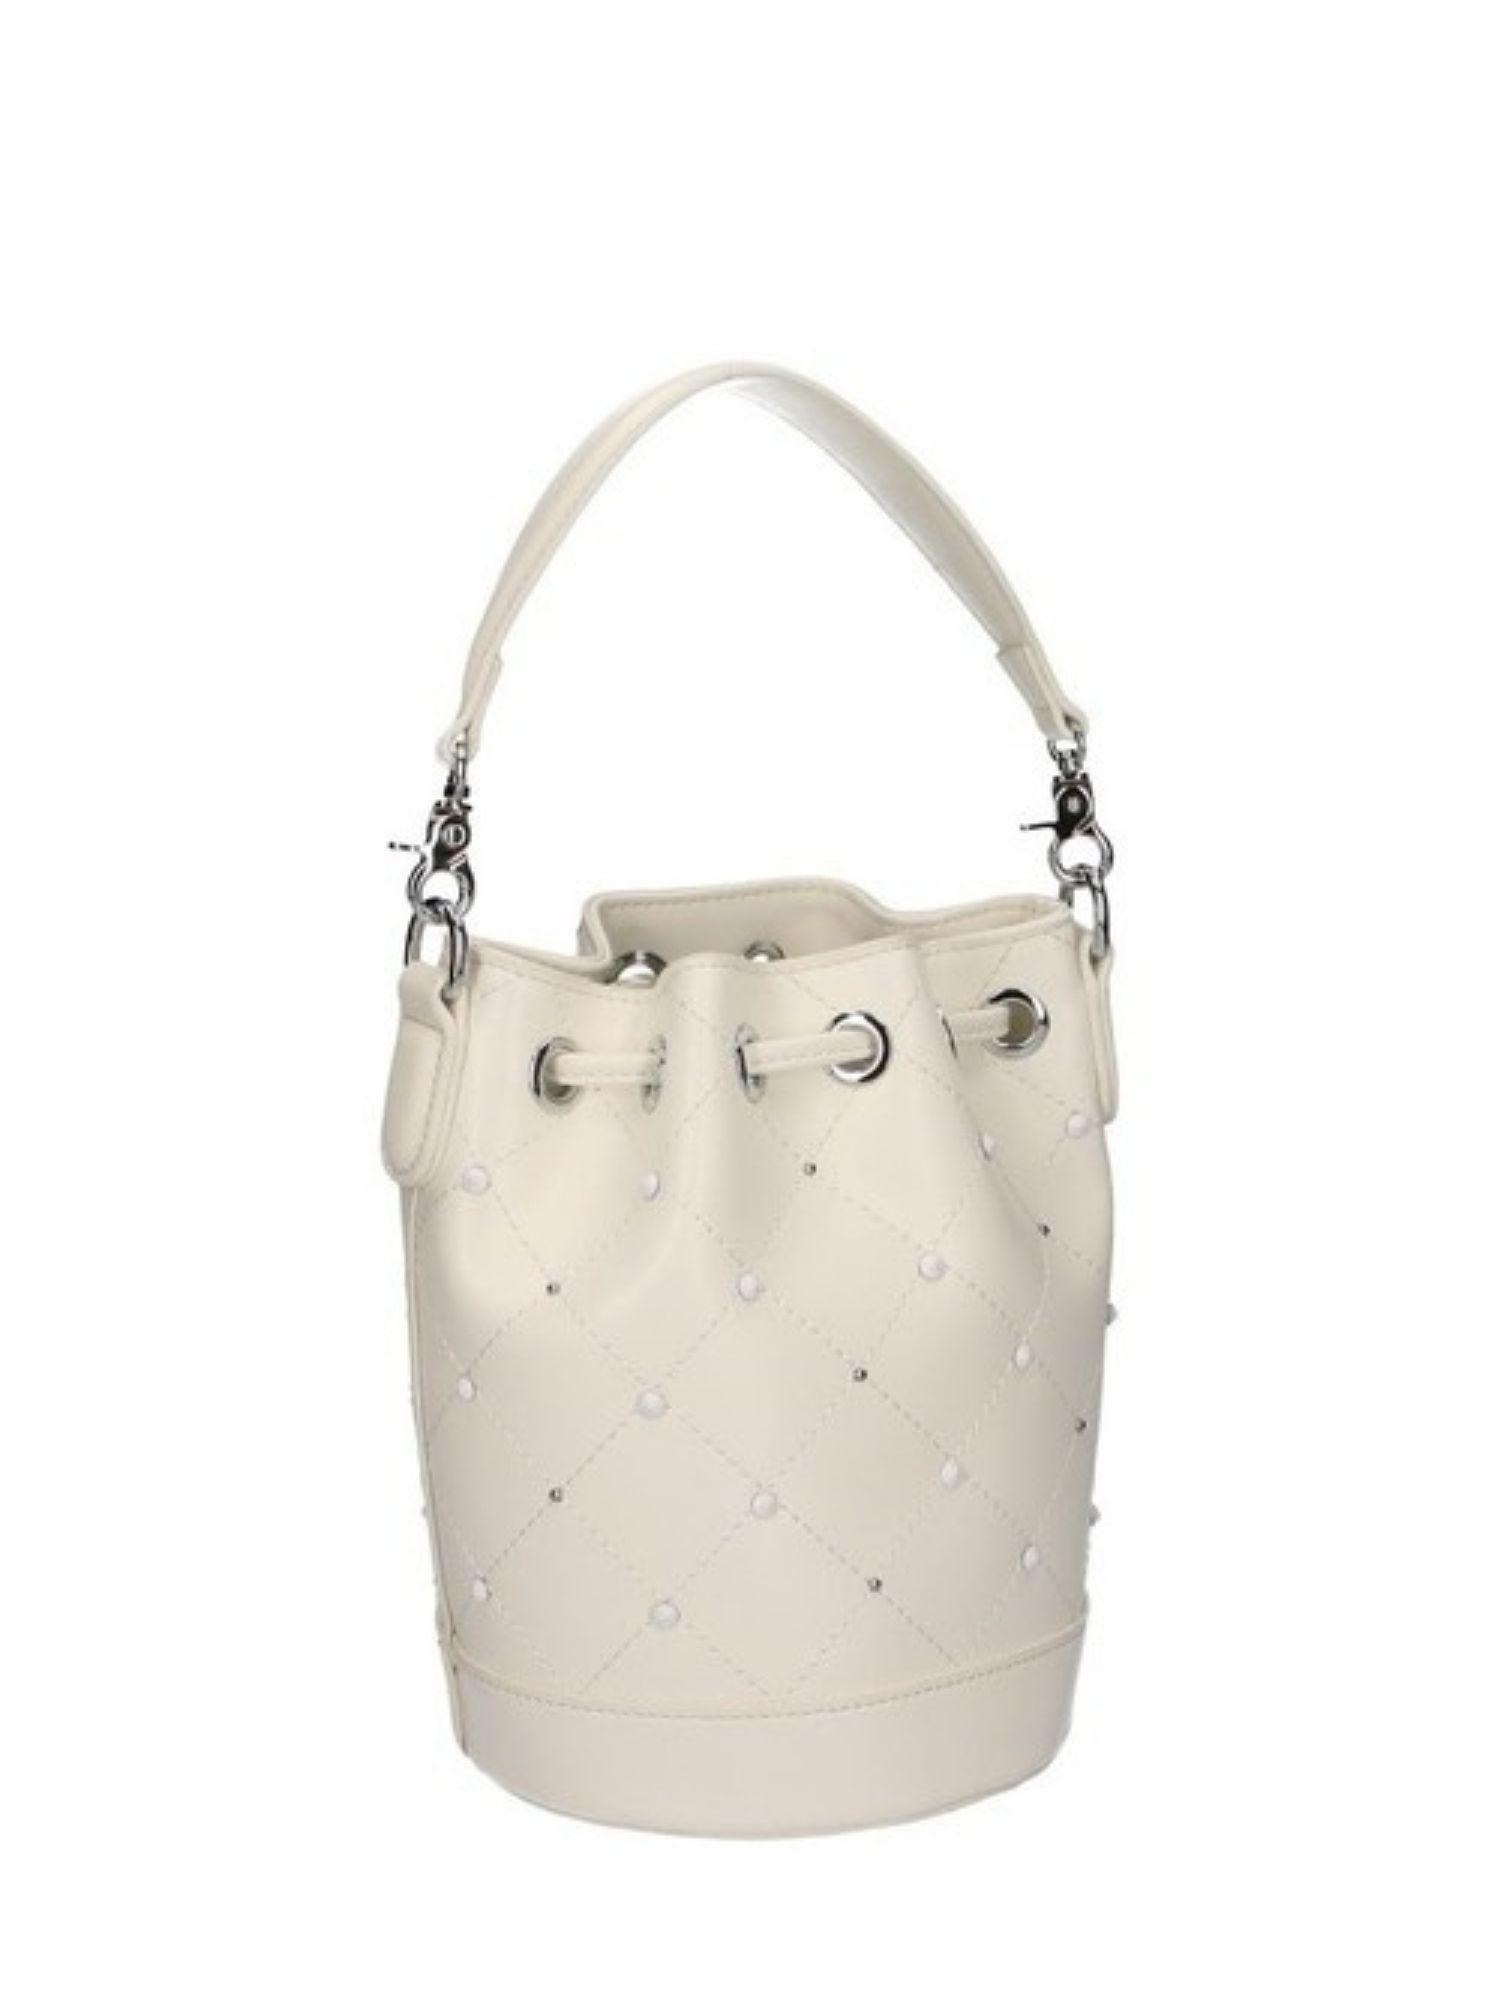 Borsa secchiello Atelier Du Sac Pash Bag 10964 Bianco 2